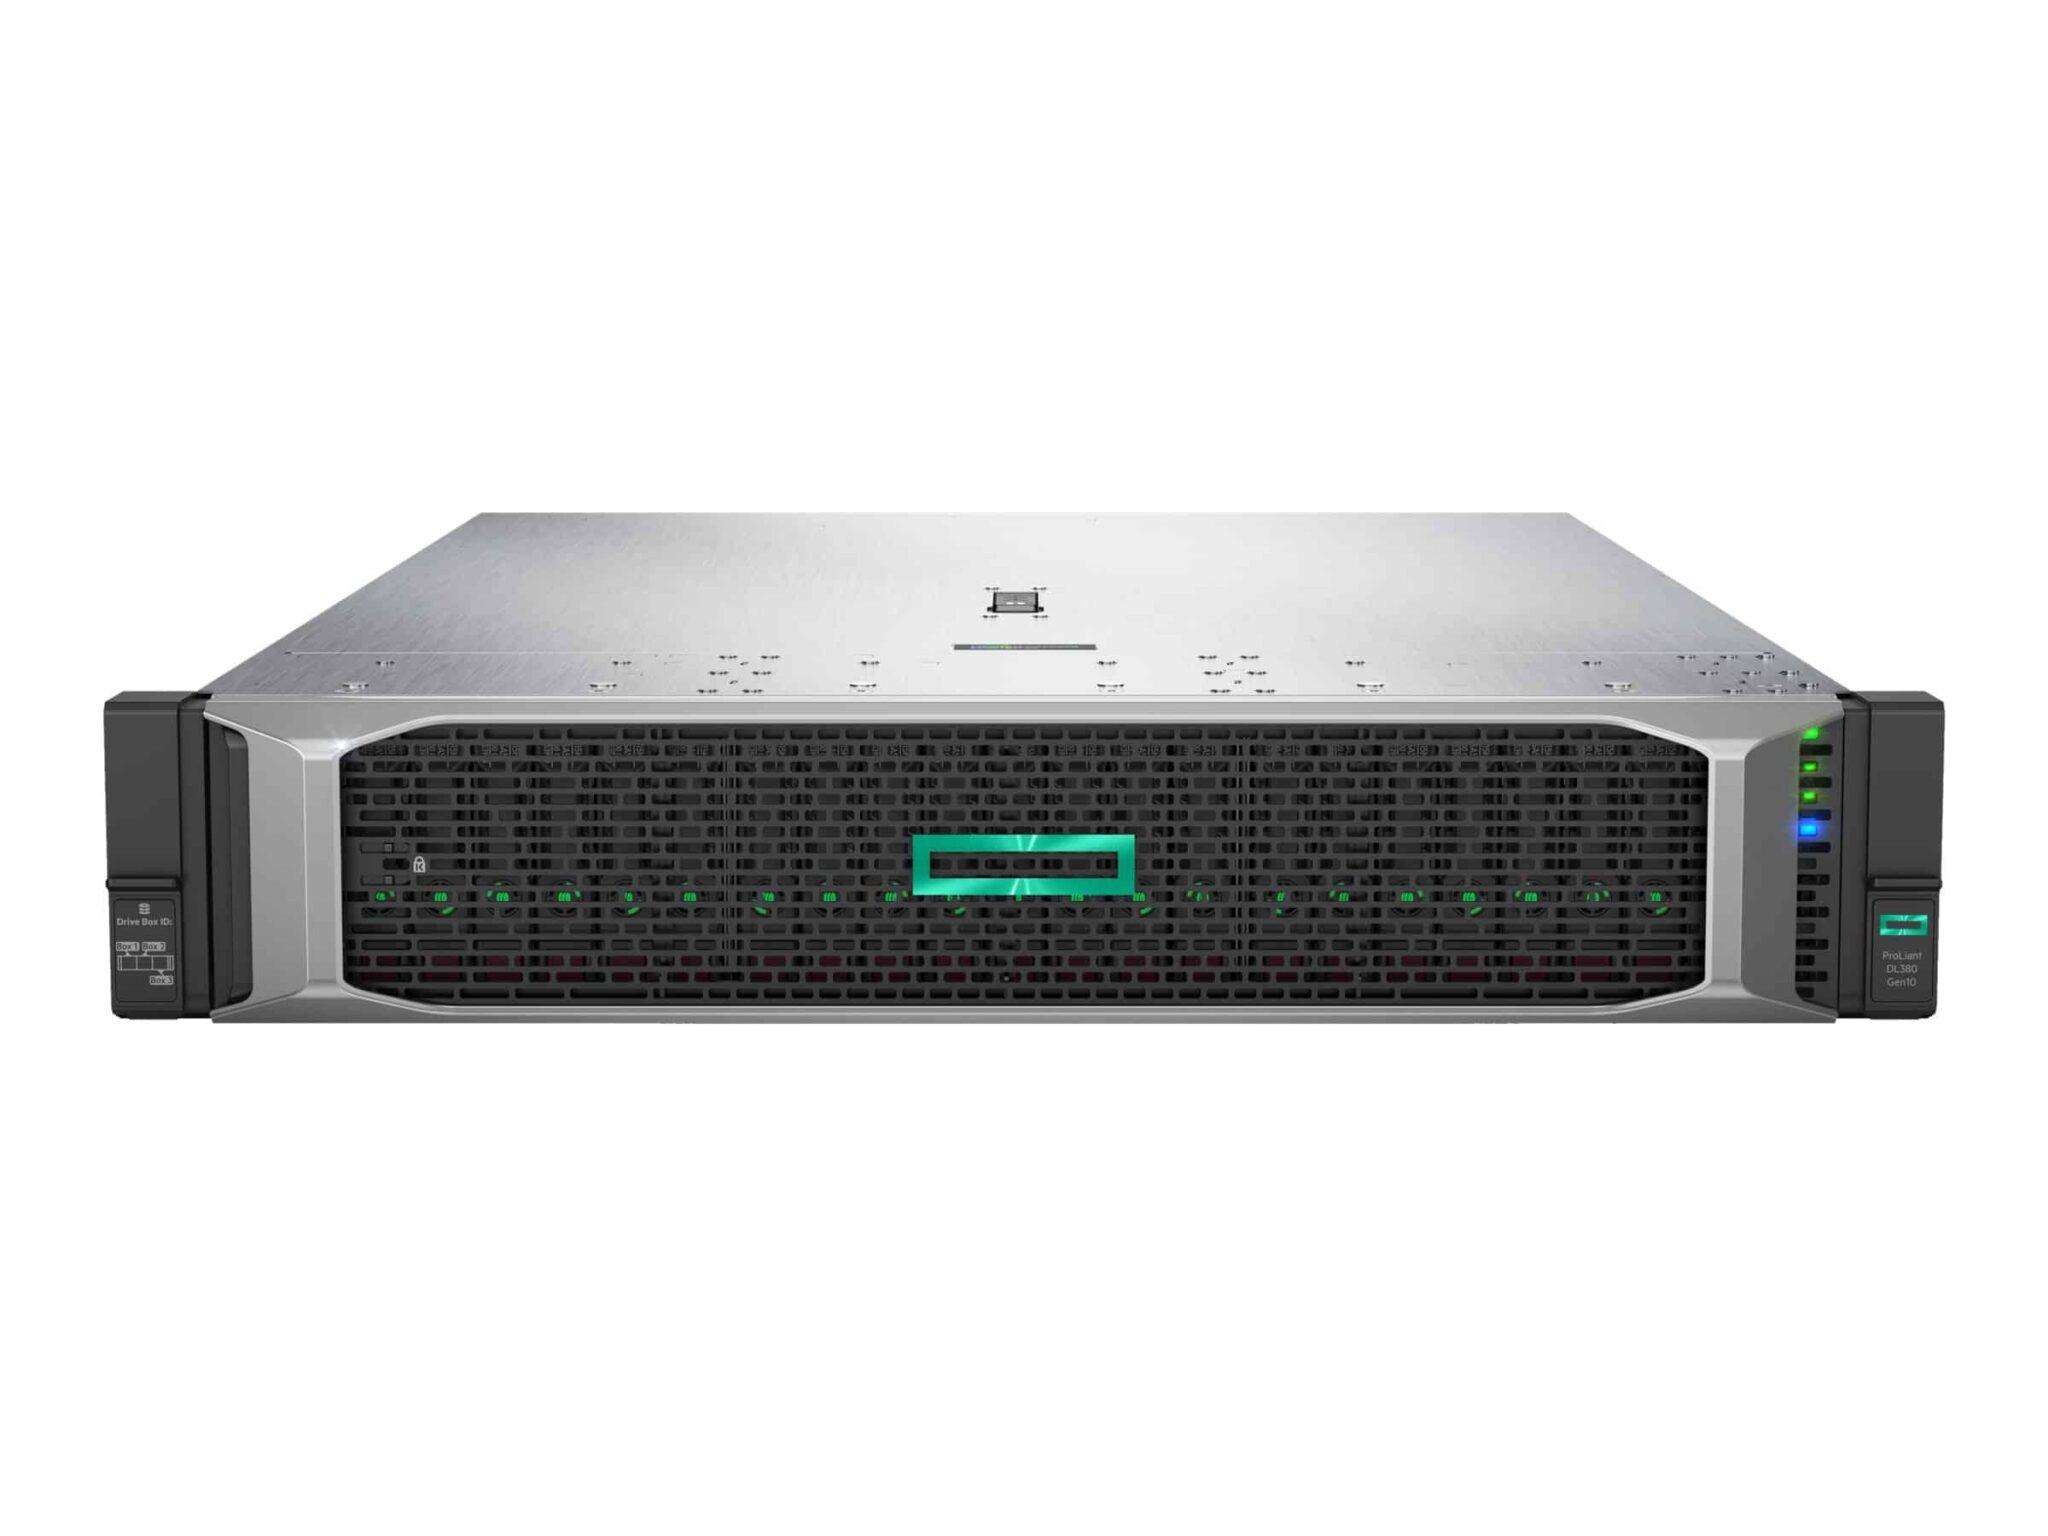 HPE-DL380-Gen10-3106-1P-16GB-8SFF-Server-Smart-Buy